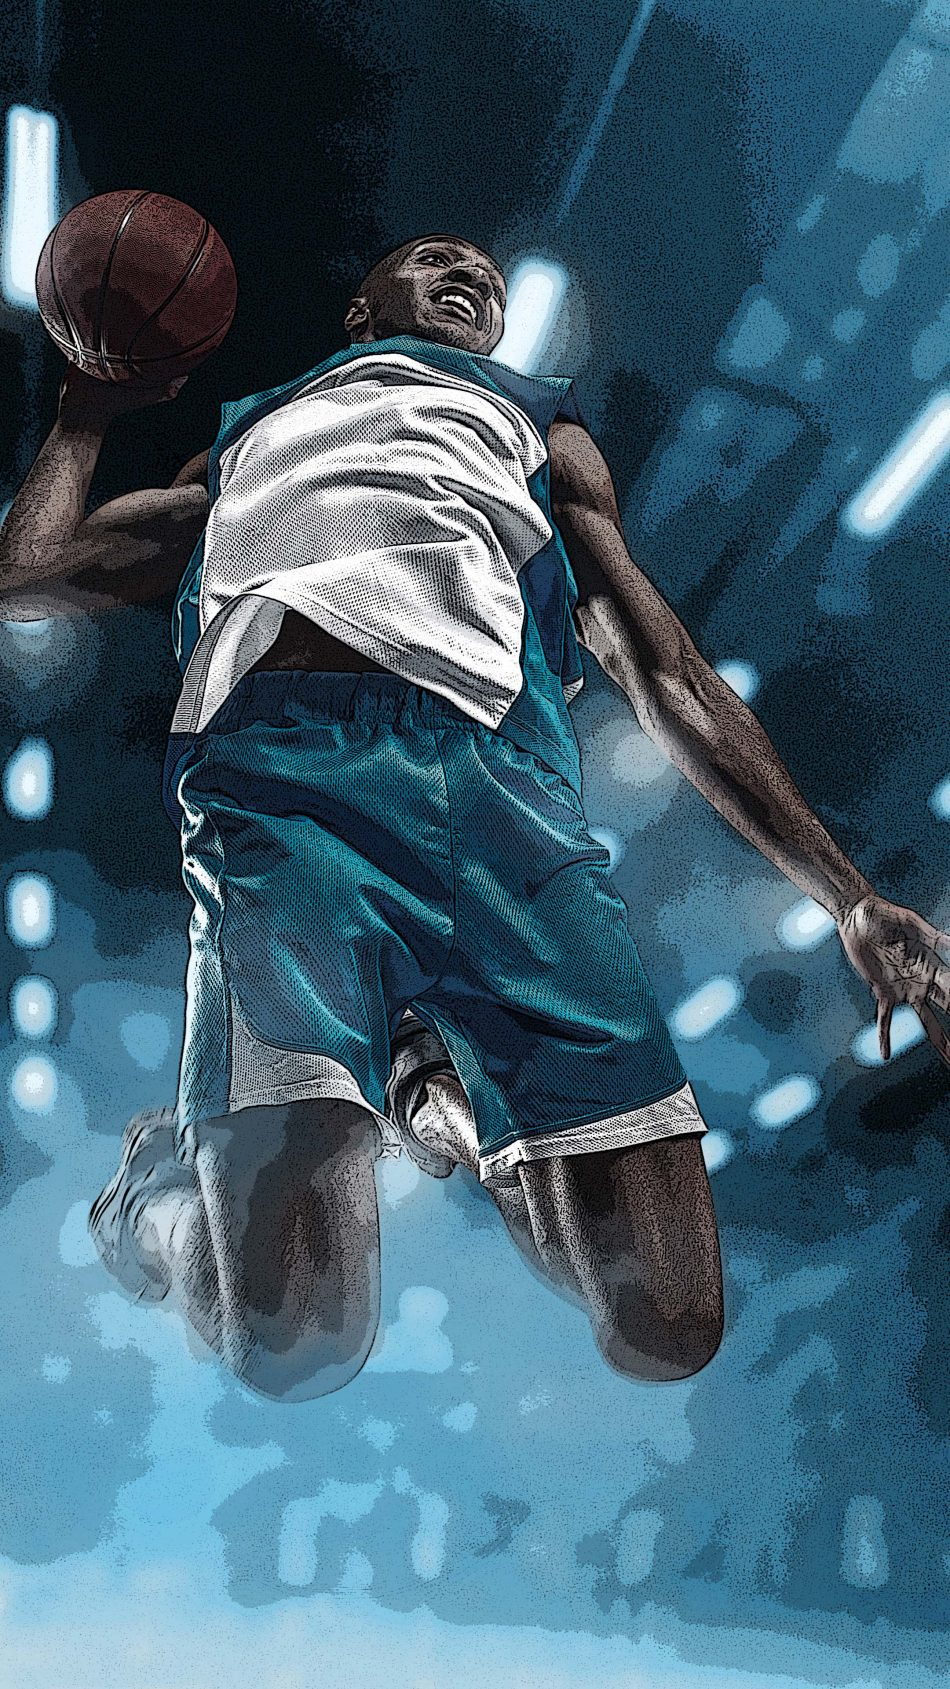 Basketball Sports Artwork 4k Ultra Hd Mobile Wallpaper 950x1689